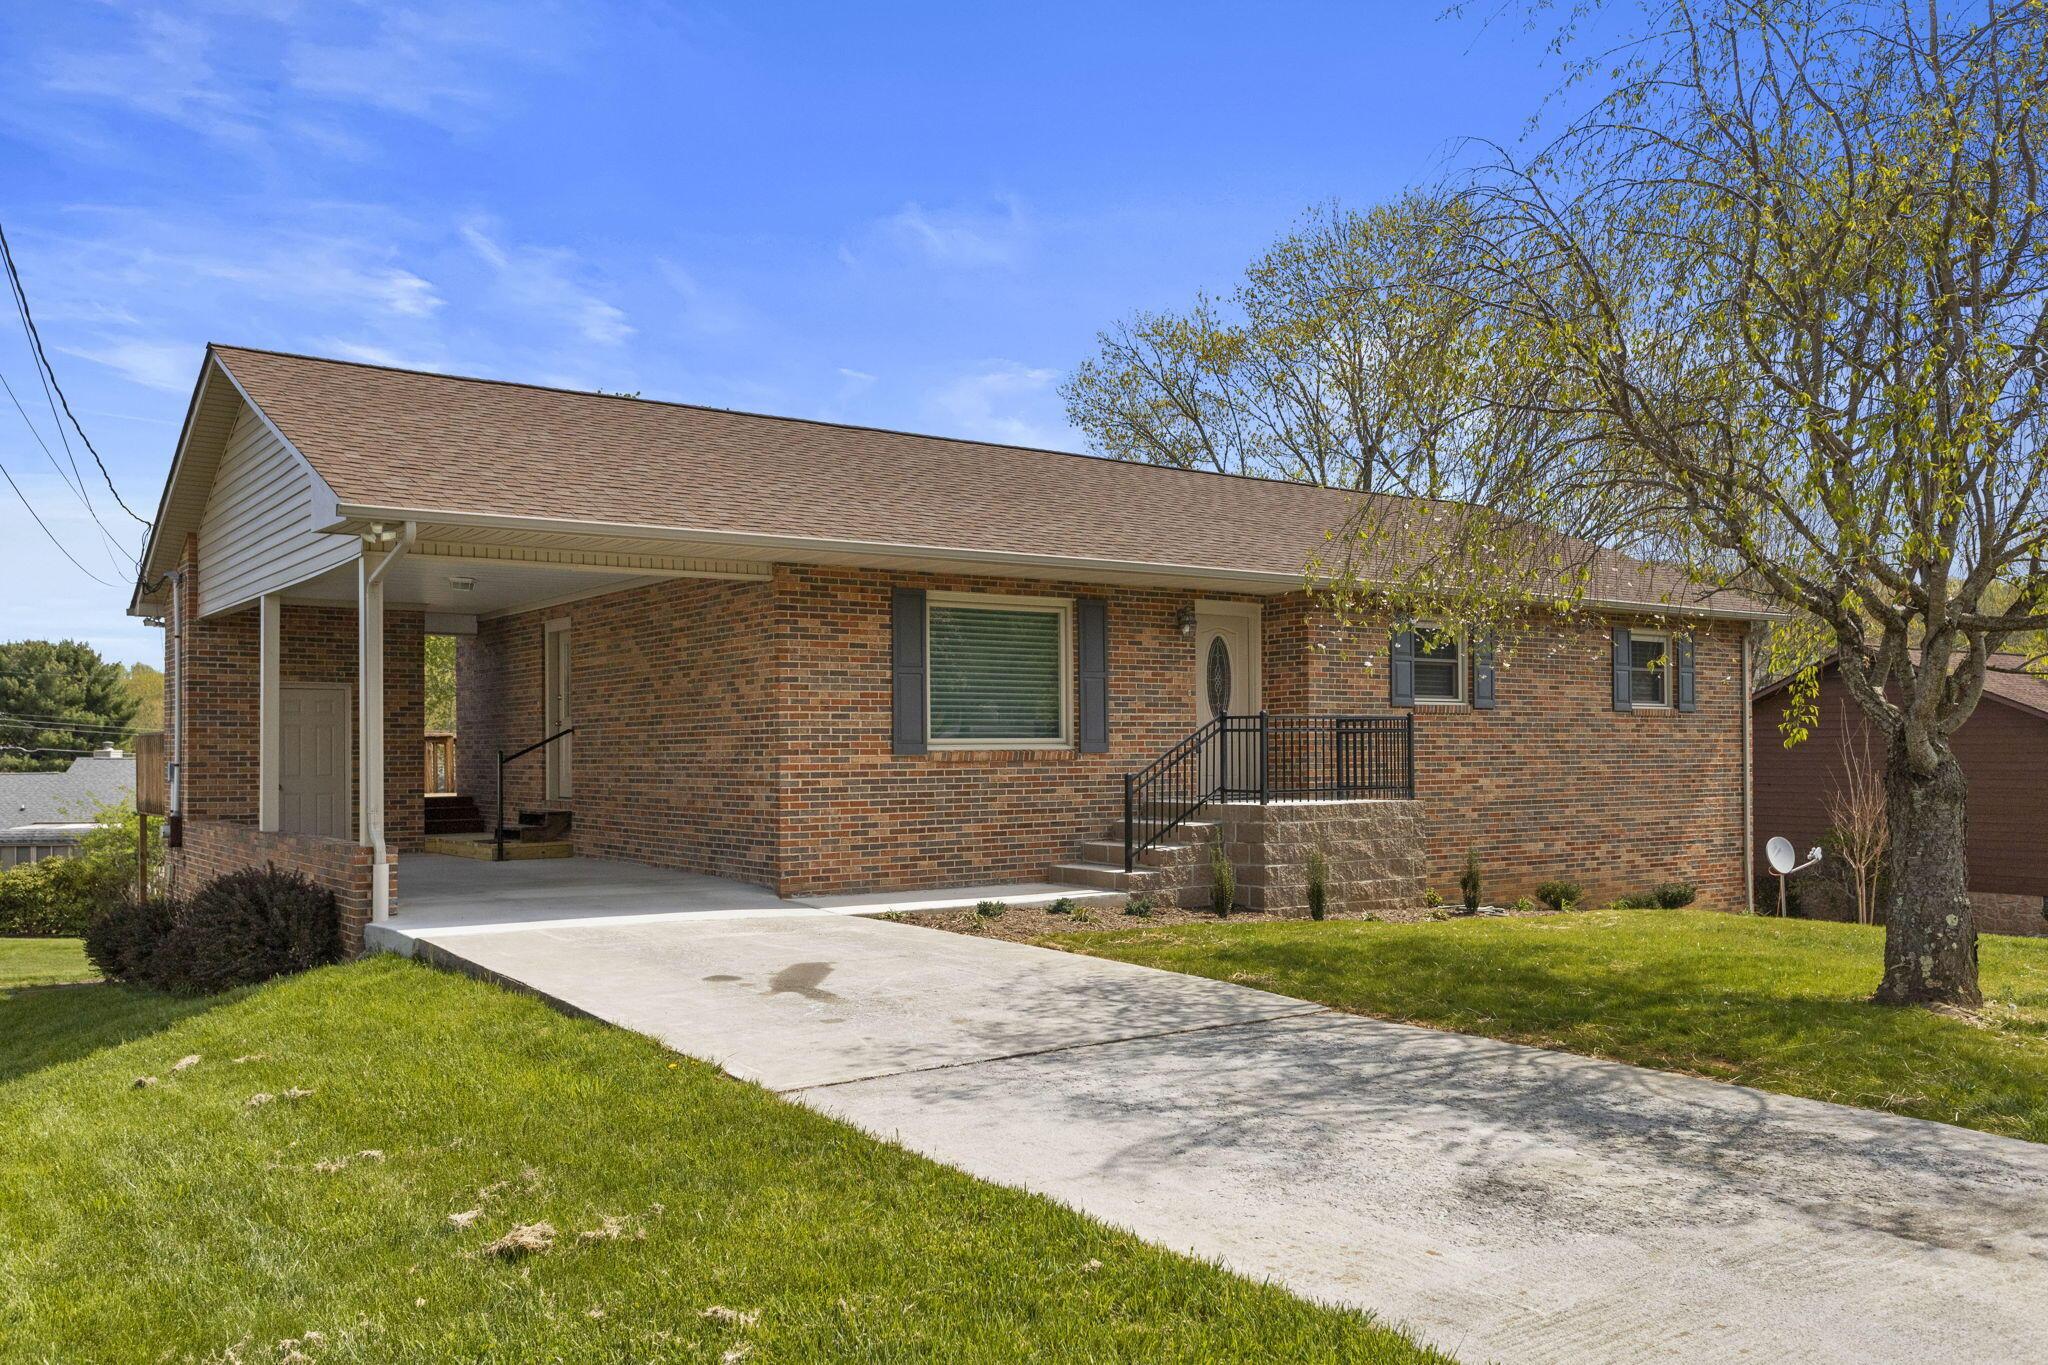 1913 Jamestown Road, Johnson City, Tennessee 37604, ,2 BathroomsBathrooms,Single Family,For Sale,1913 Jamestown Road,9921174